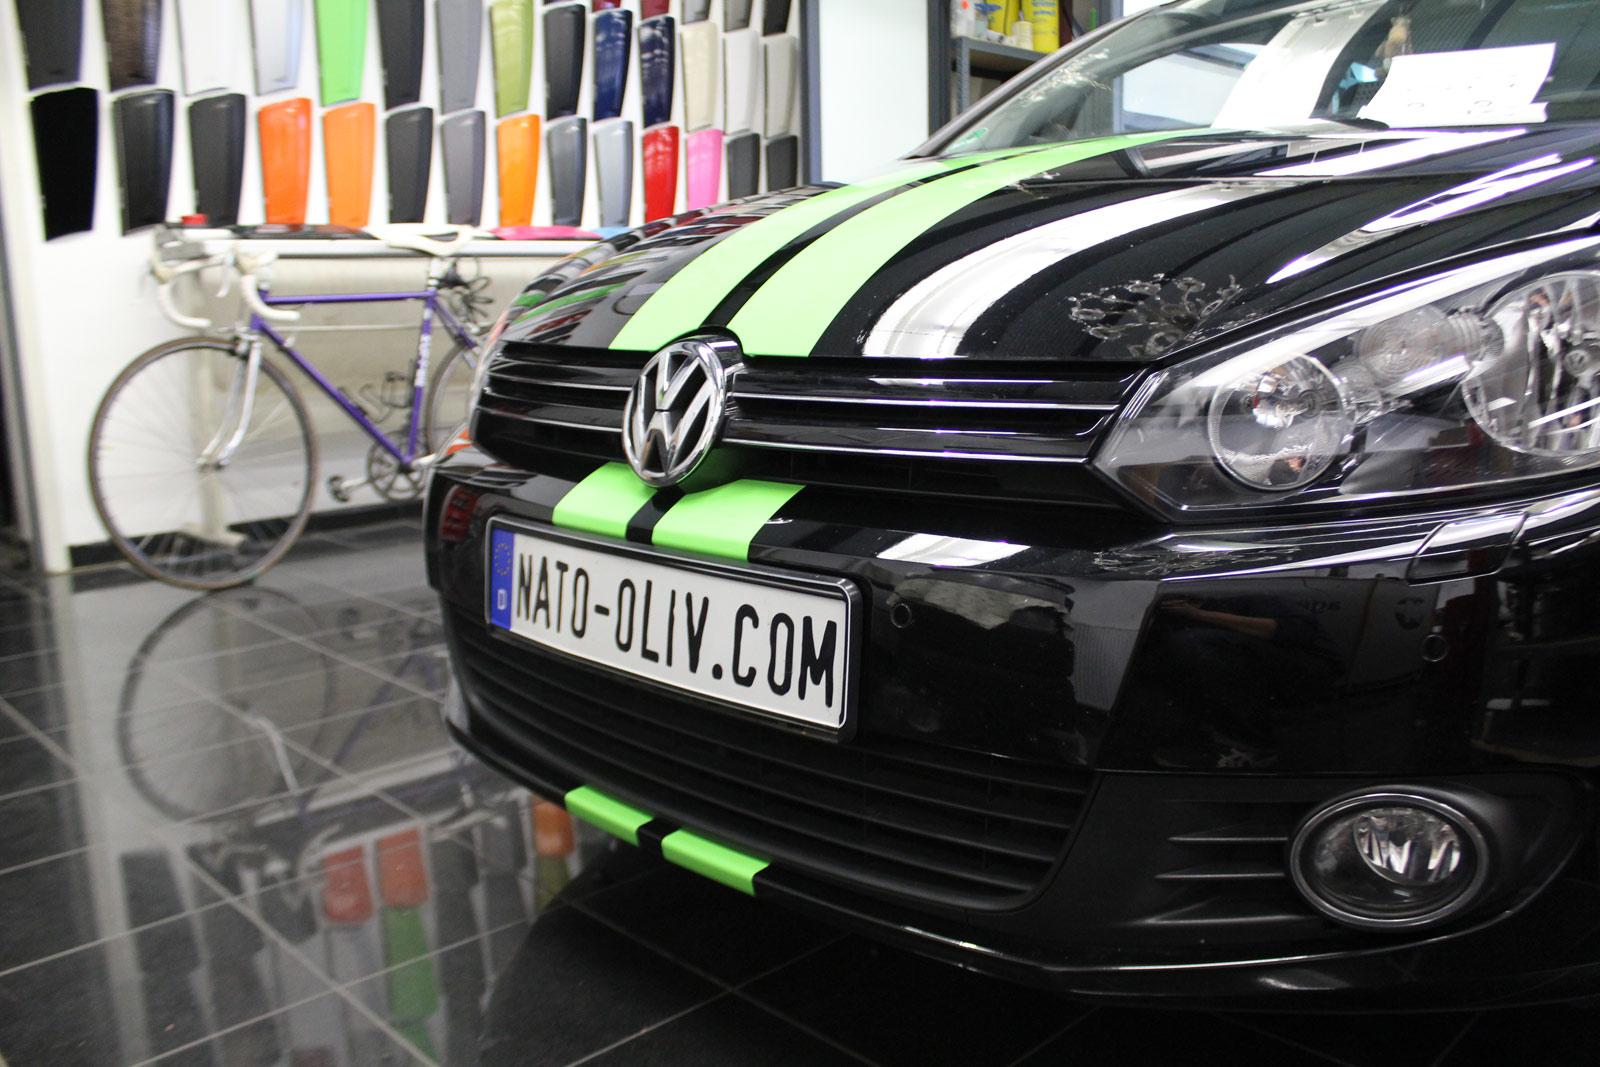 VW_GOLF_RALLYE_STREIFEN_GRUENE_FOLIE_42